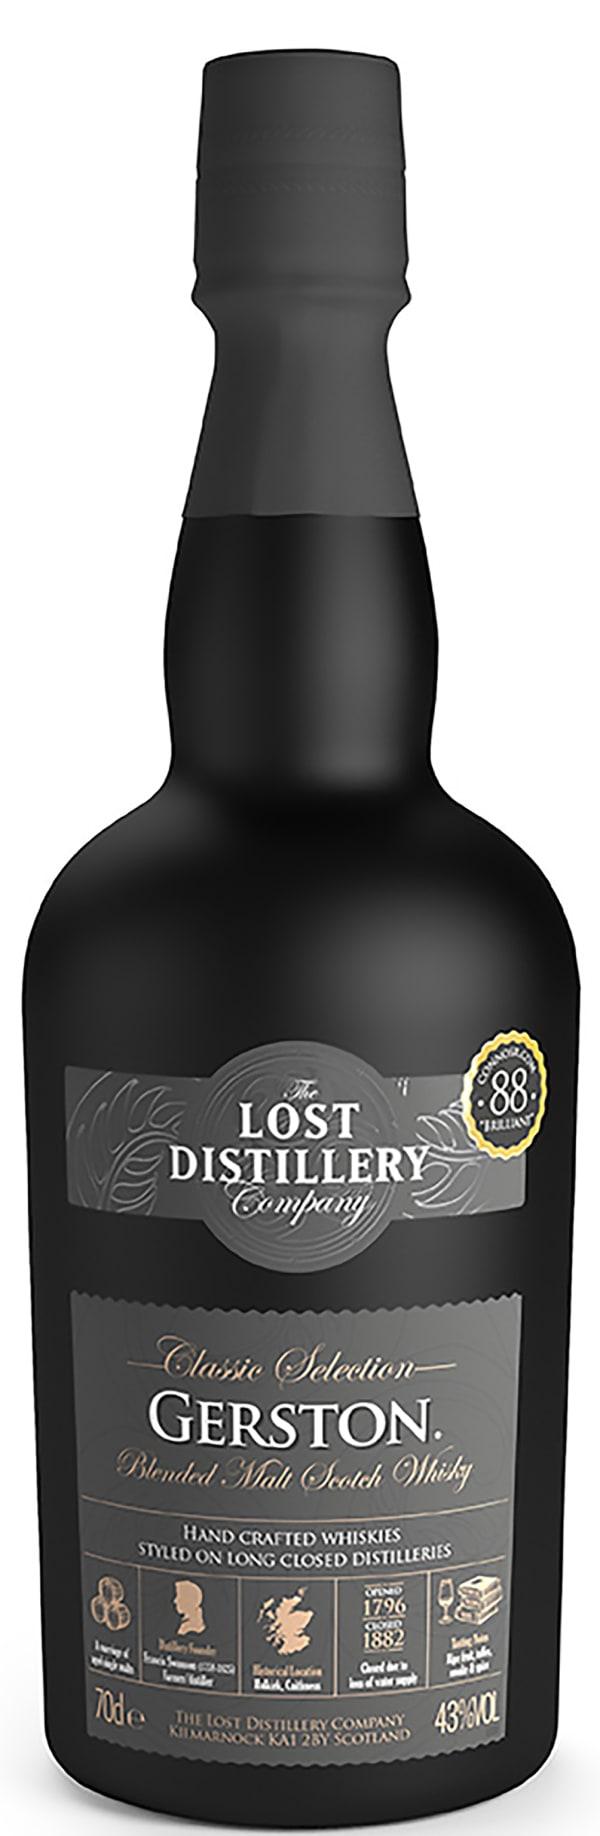 The Lost Distillery Gerston Blended Malt